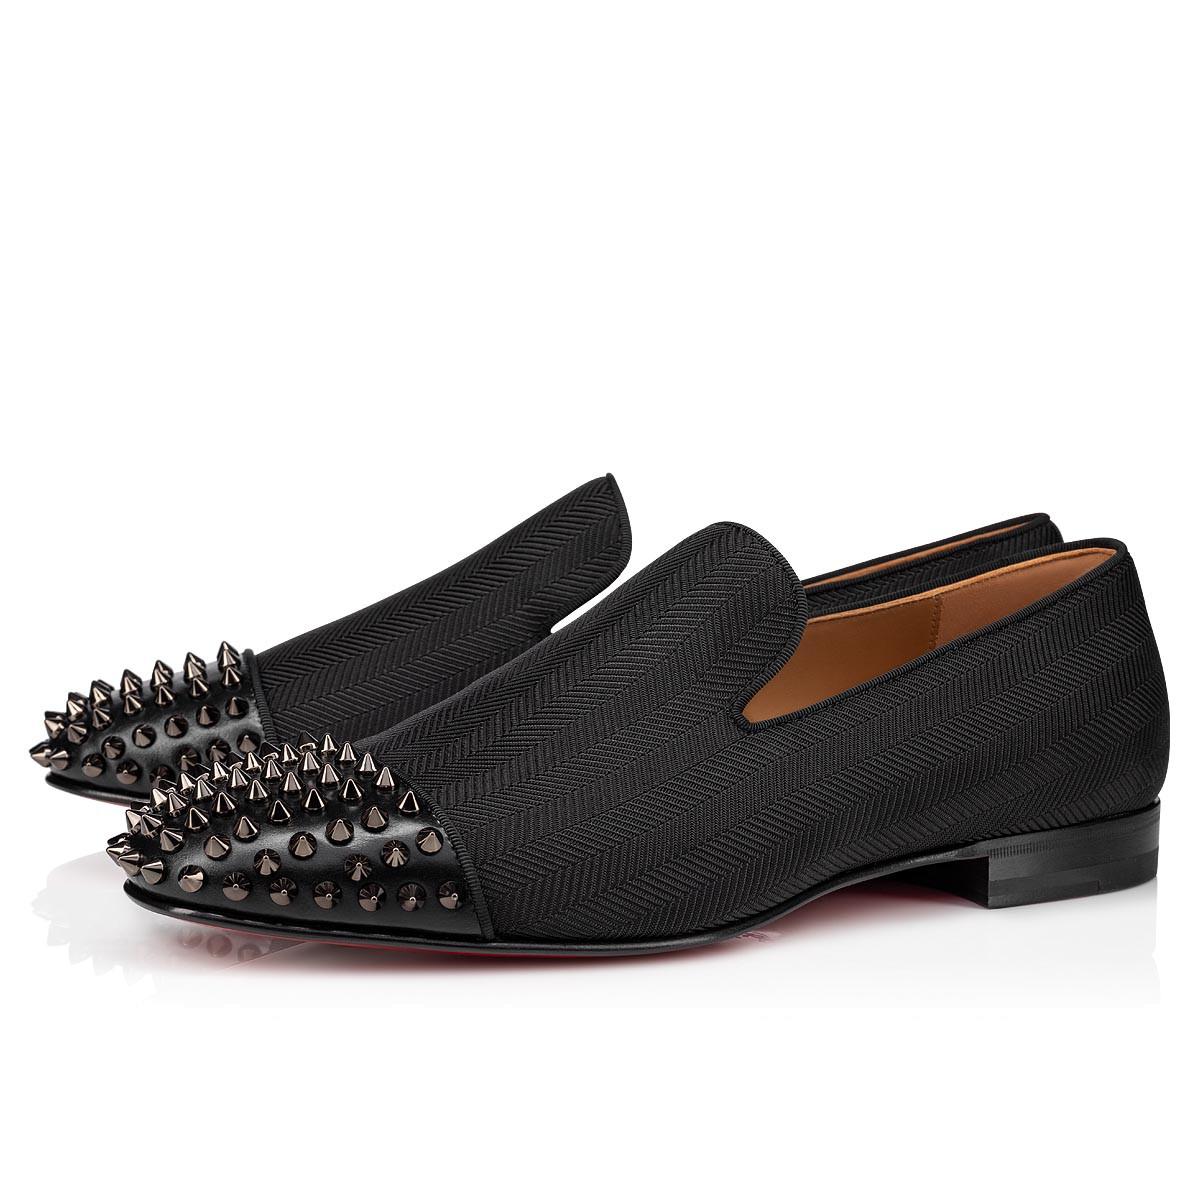 Shoes - Spooky - Christian Louboutin